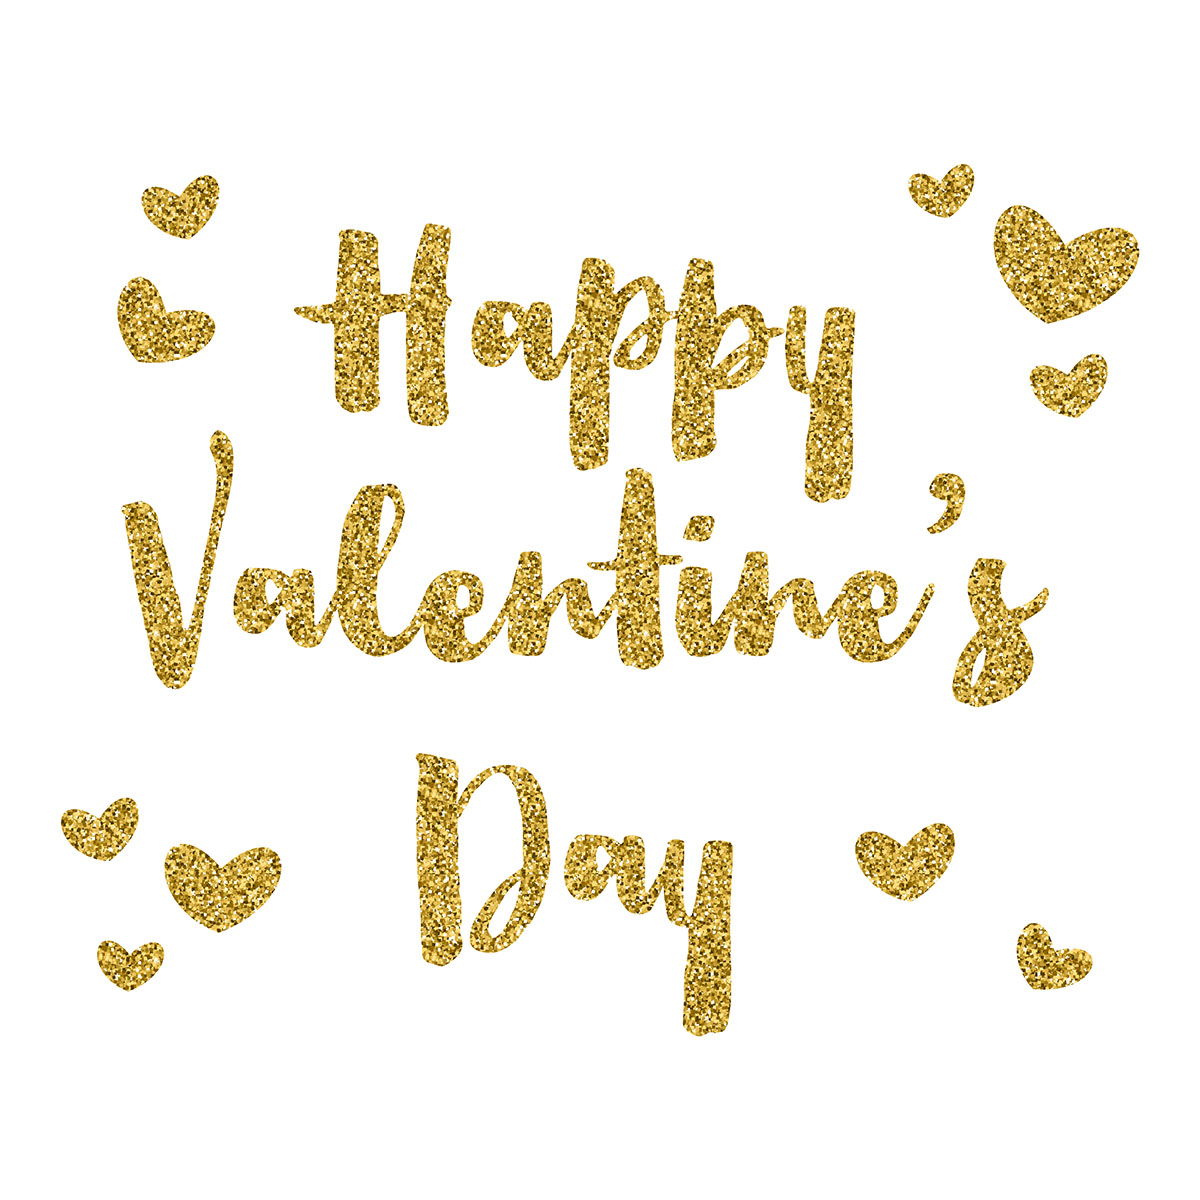 Glitter Valentines Day Background Download Free Vector